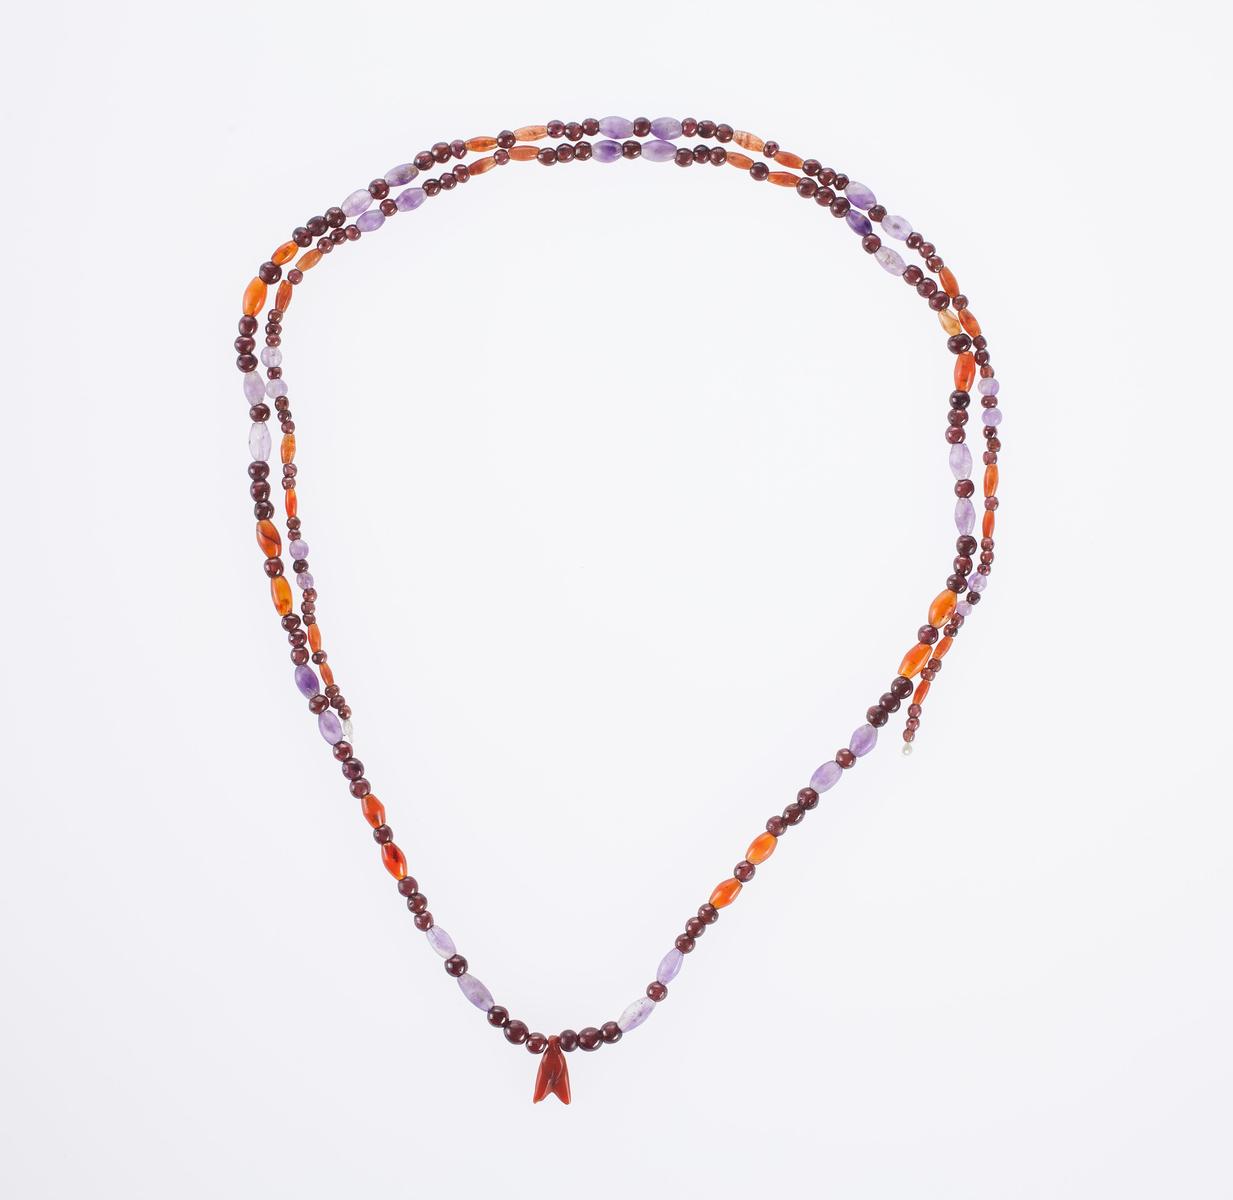 Ancient Egyptian Jewelry | LoveToKnow